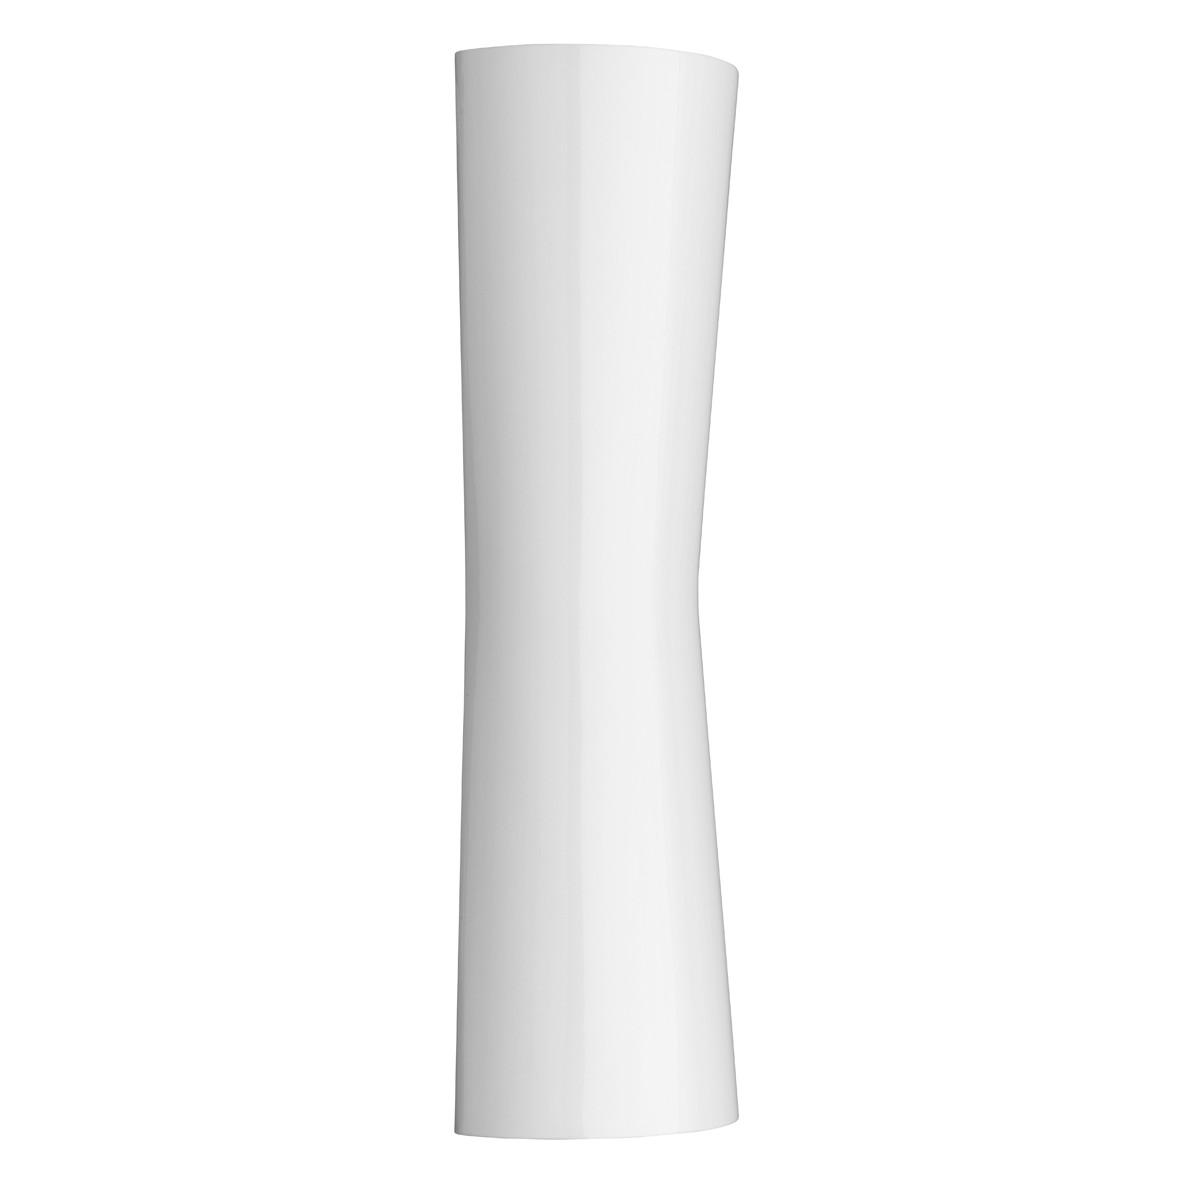 Flos Clessidra Wandleuchte, weiß, Abstrahlwinkel: 20° + 20°